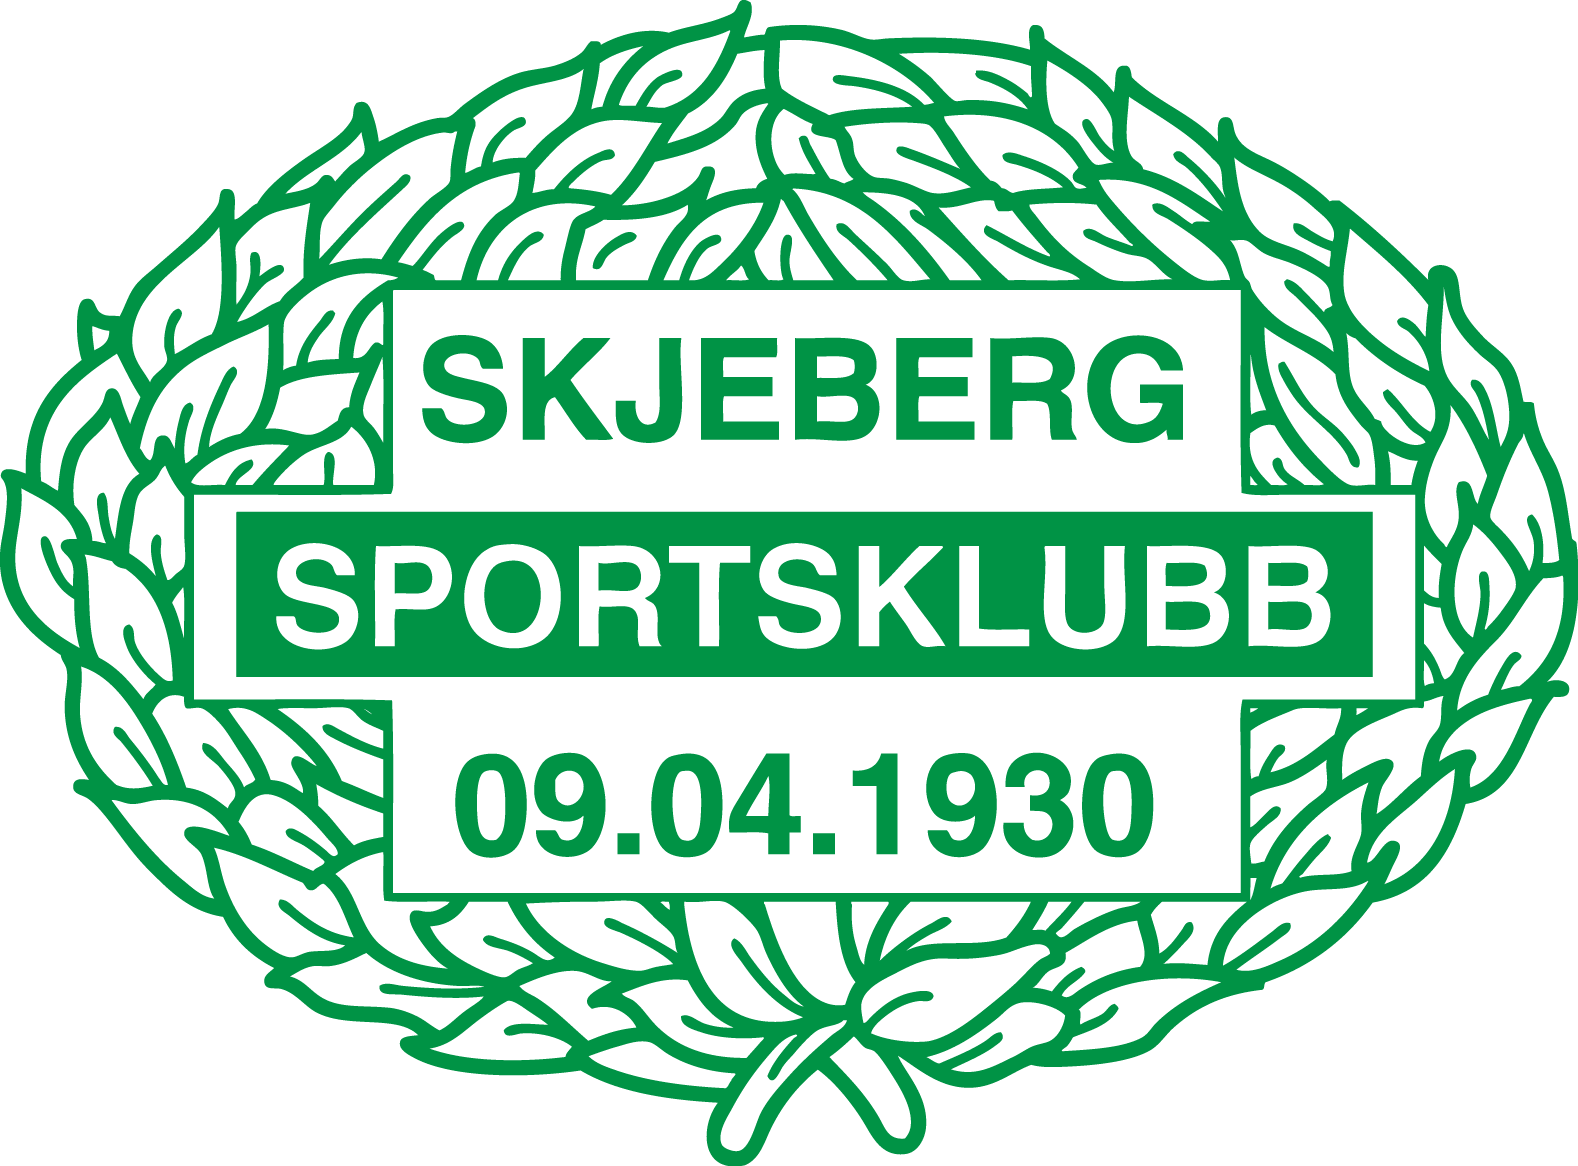 Skjeberg Sportsklubb